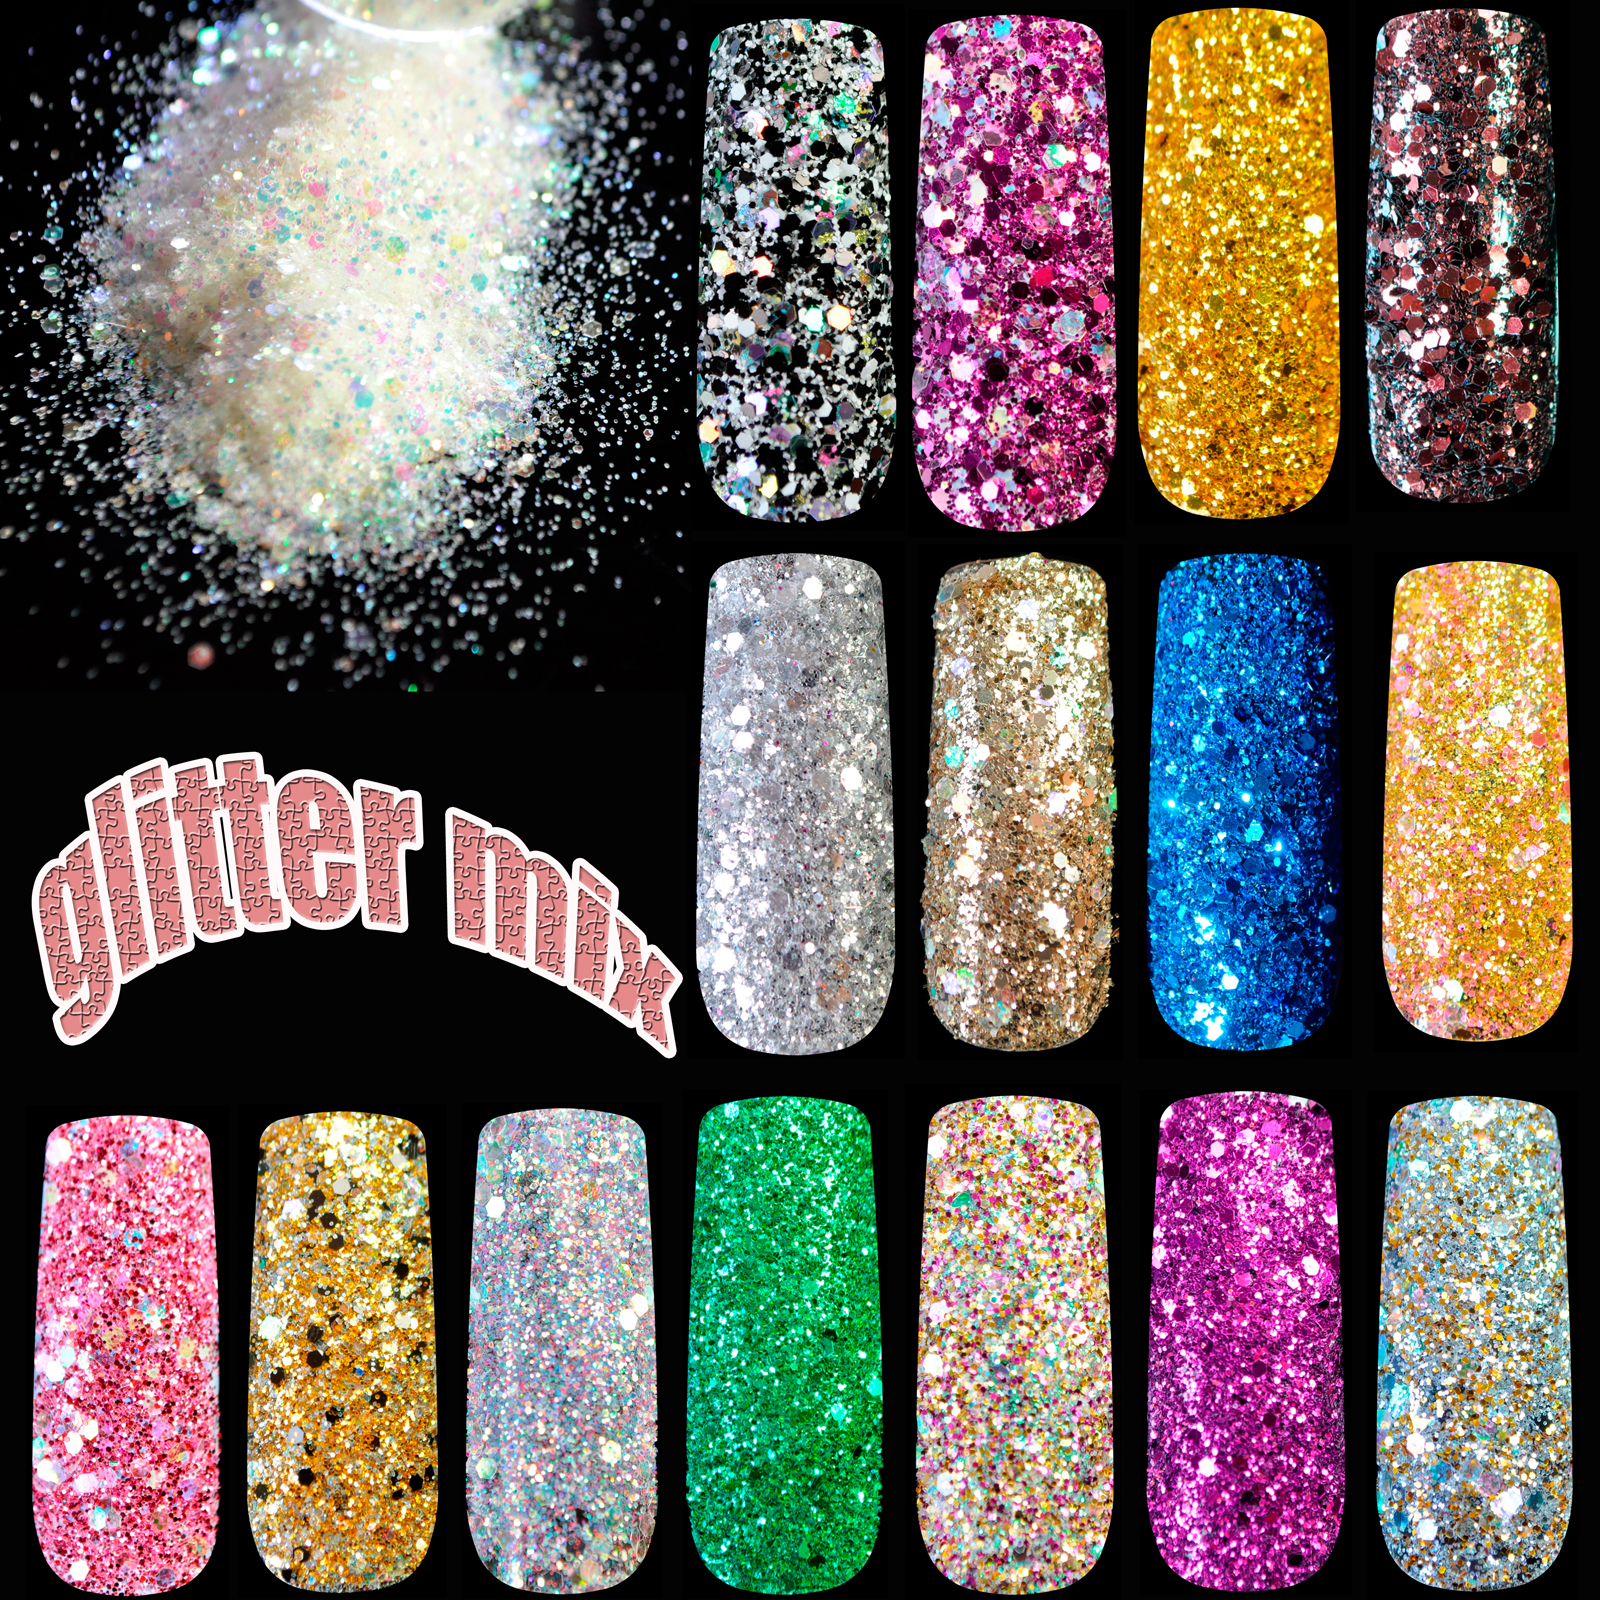 Mezcla Nail Art Glitter Powder Color Lentejuelas Maquillaje Nail - Arte de uñas